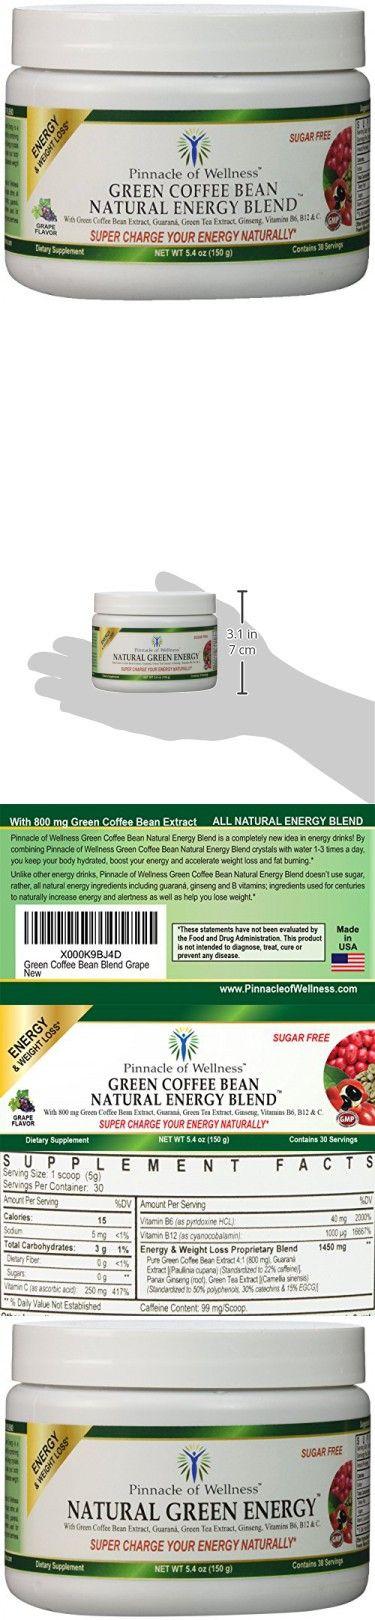 Pinnacle of Wellness Natural Green Energy Powder  Grape Flavor  30 Servings  5.4oz (150g)  With Pure Green Coffee Bean Extract 800mg - Green Tea Leaf  Asian Ginseng Root & Guaran Seed - Vitamin C - B6 & B12 - Sugar Free Drink Mix